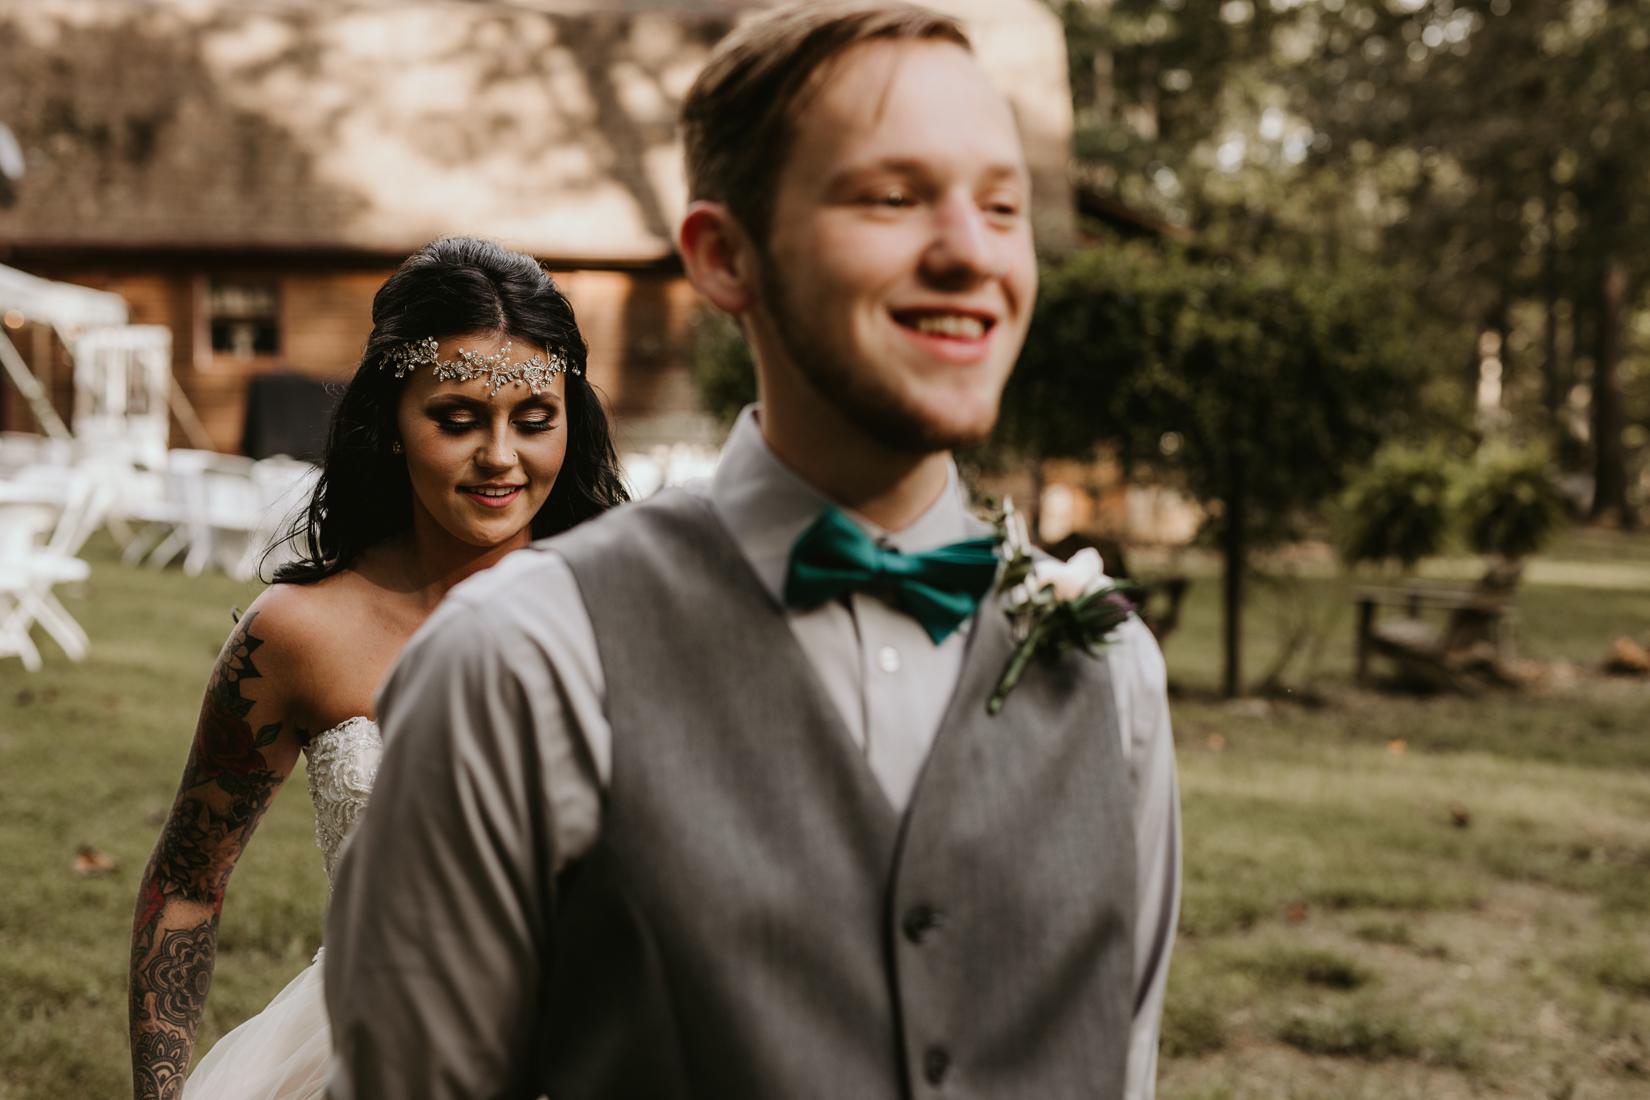 olivia_zay_wedding_09_2018-9473.jpg